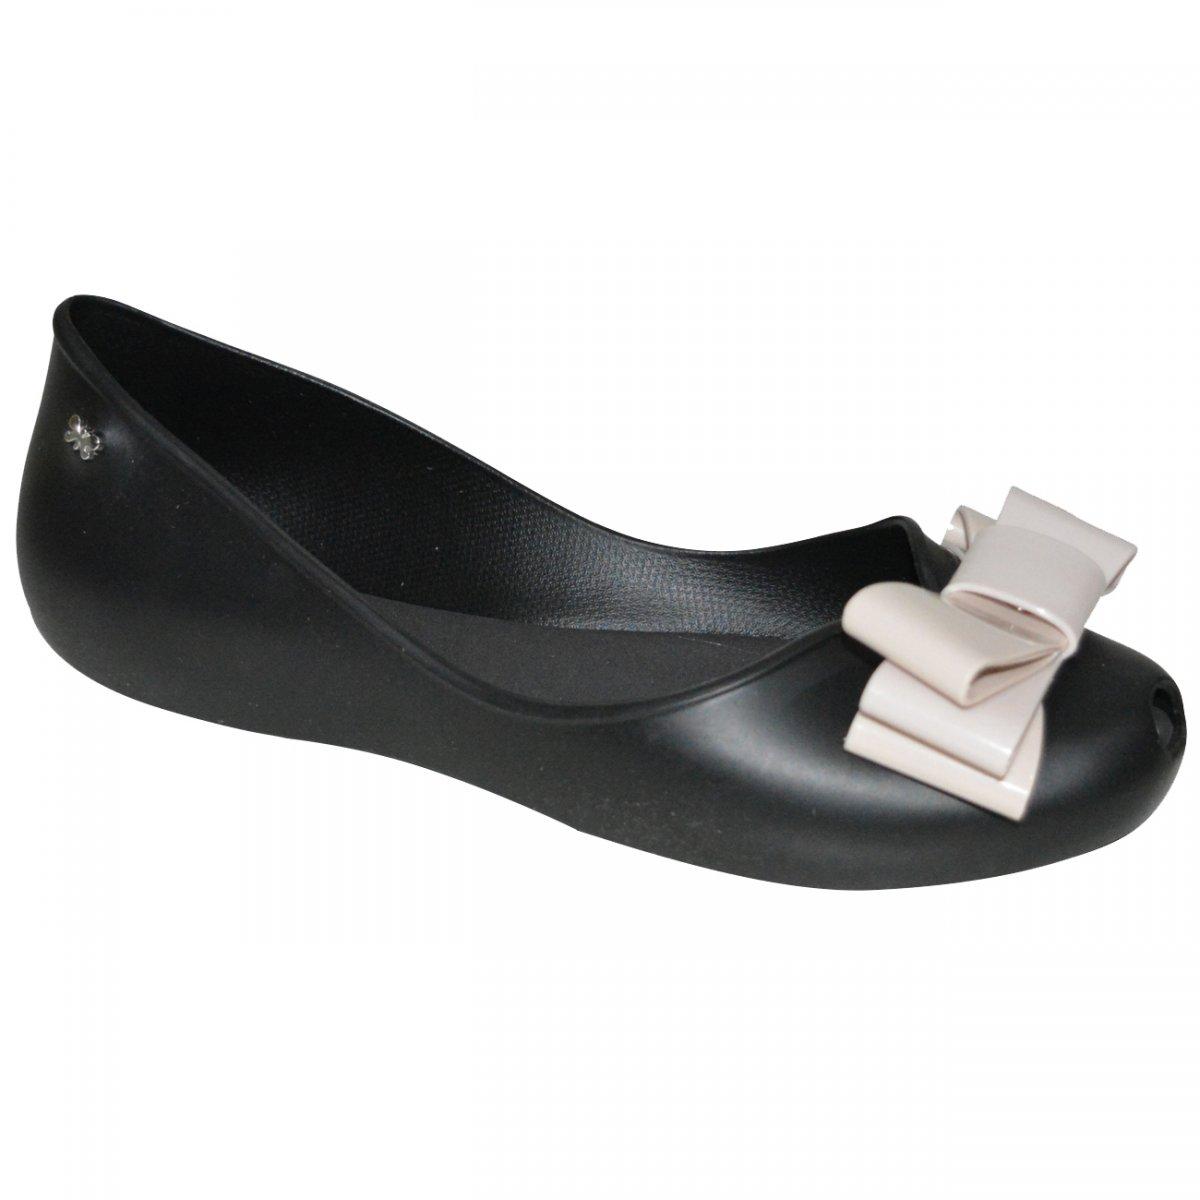 bd5aed6bb Sapatilha Zaxy Infinity Sap 17561 17561-90081 - Preto - Chuteira Nike,  Adidas. Sandalias Femininas. Sandy Calçados